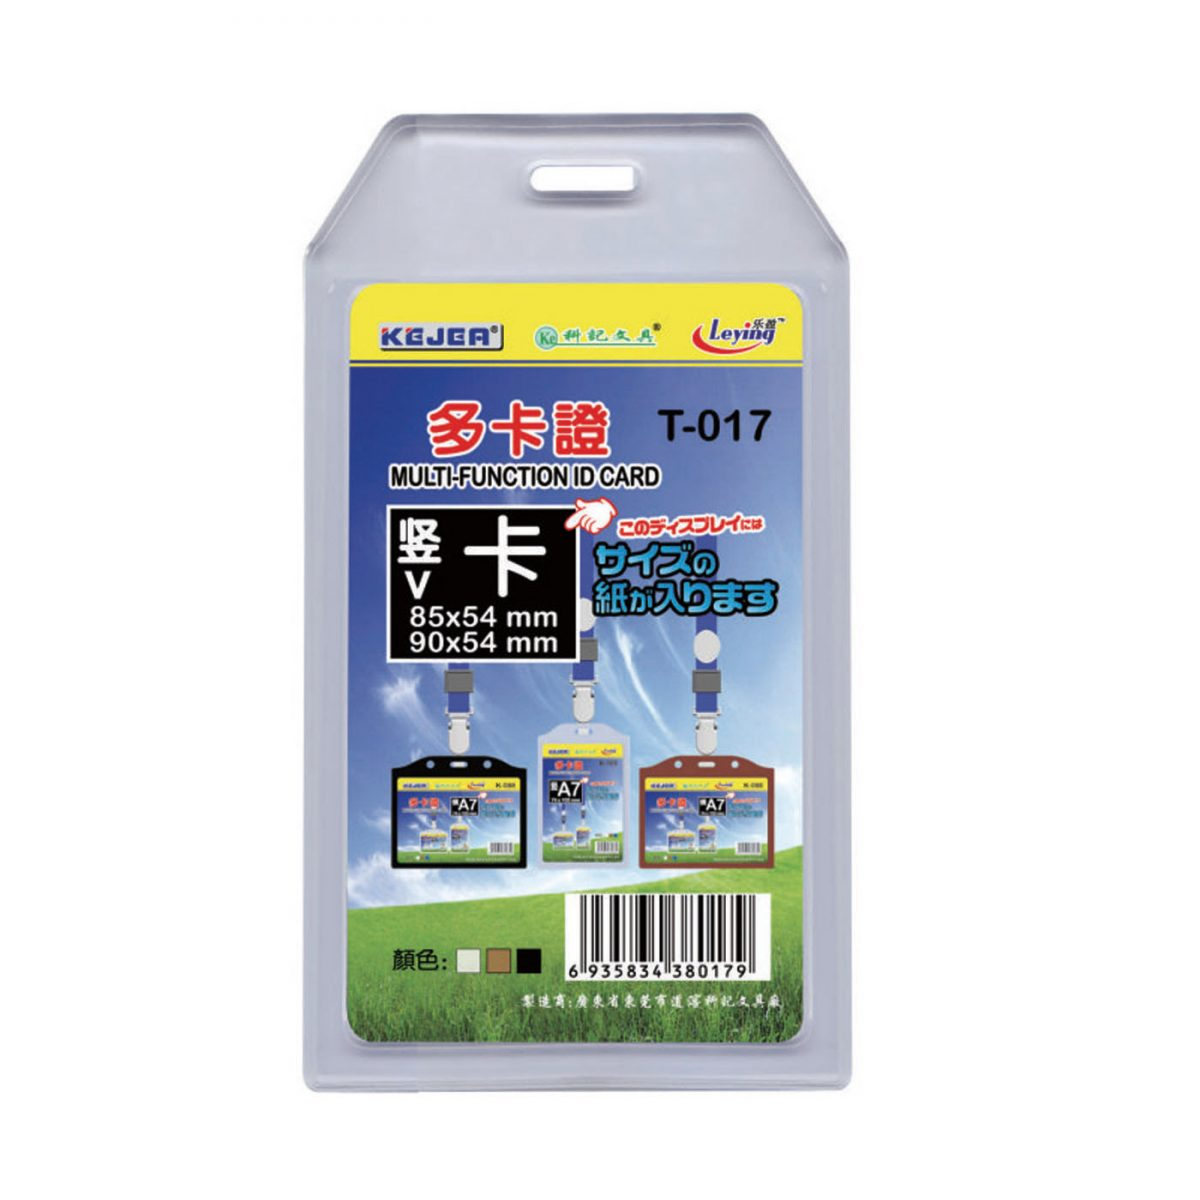 Buzunar dubla fata pentru ID carduri, PVC flexibil, 54 x 85mm